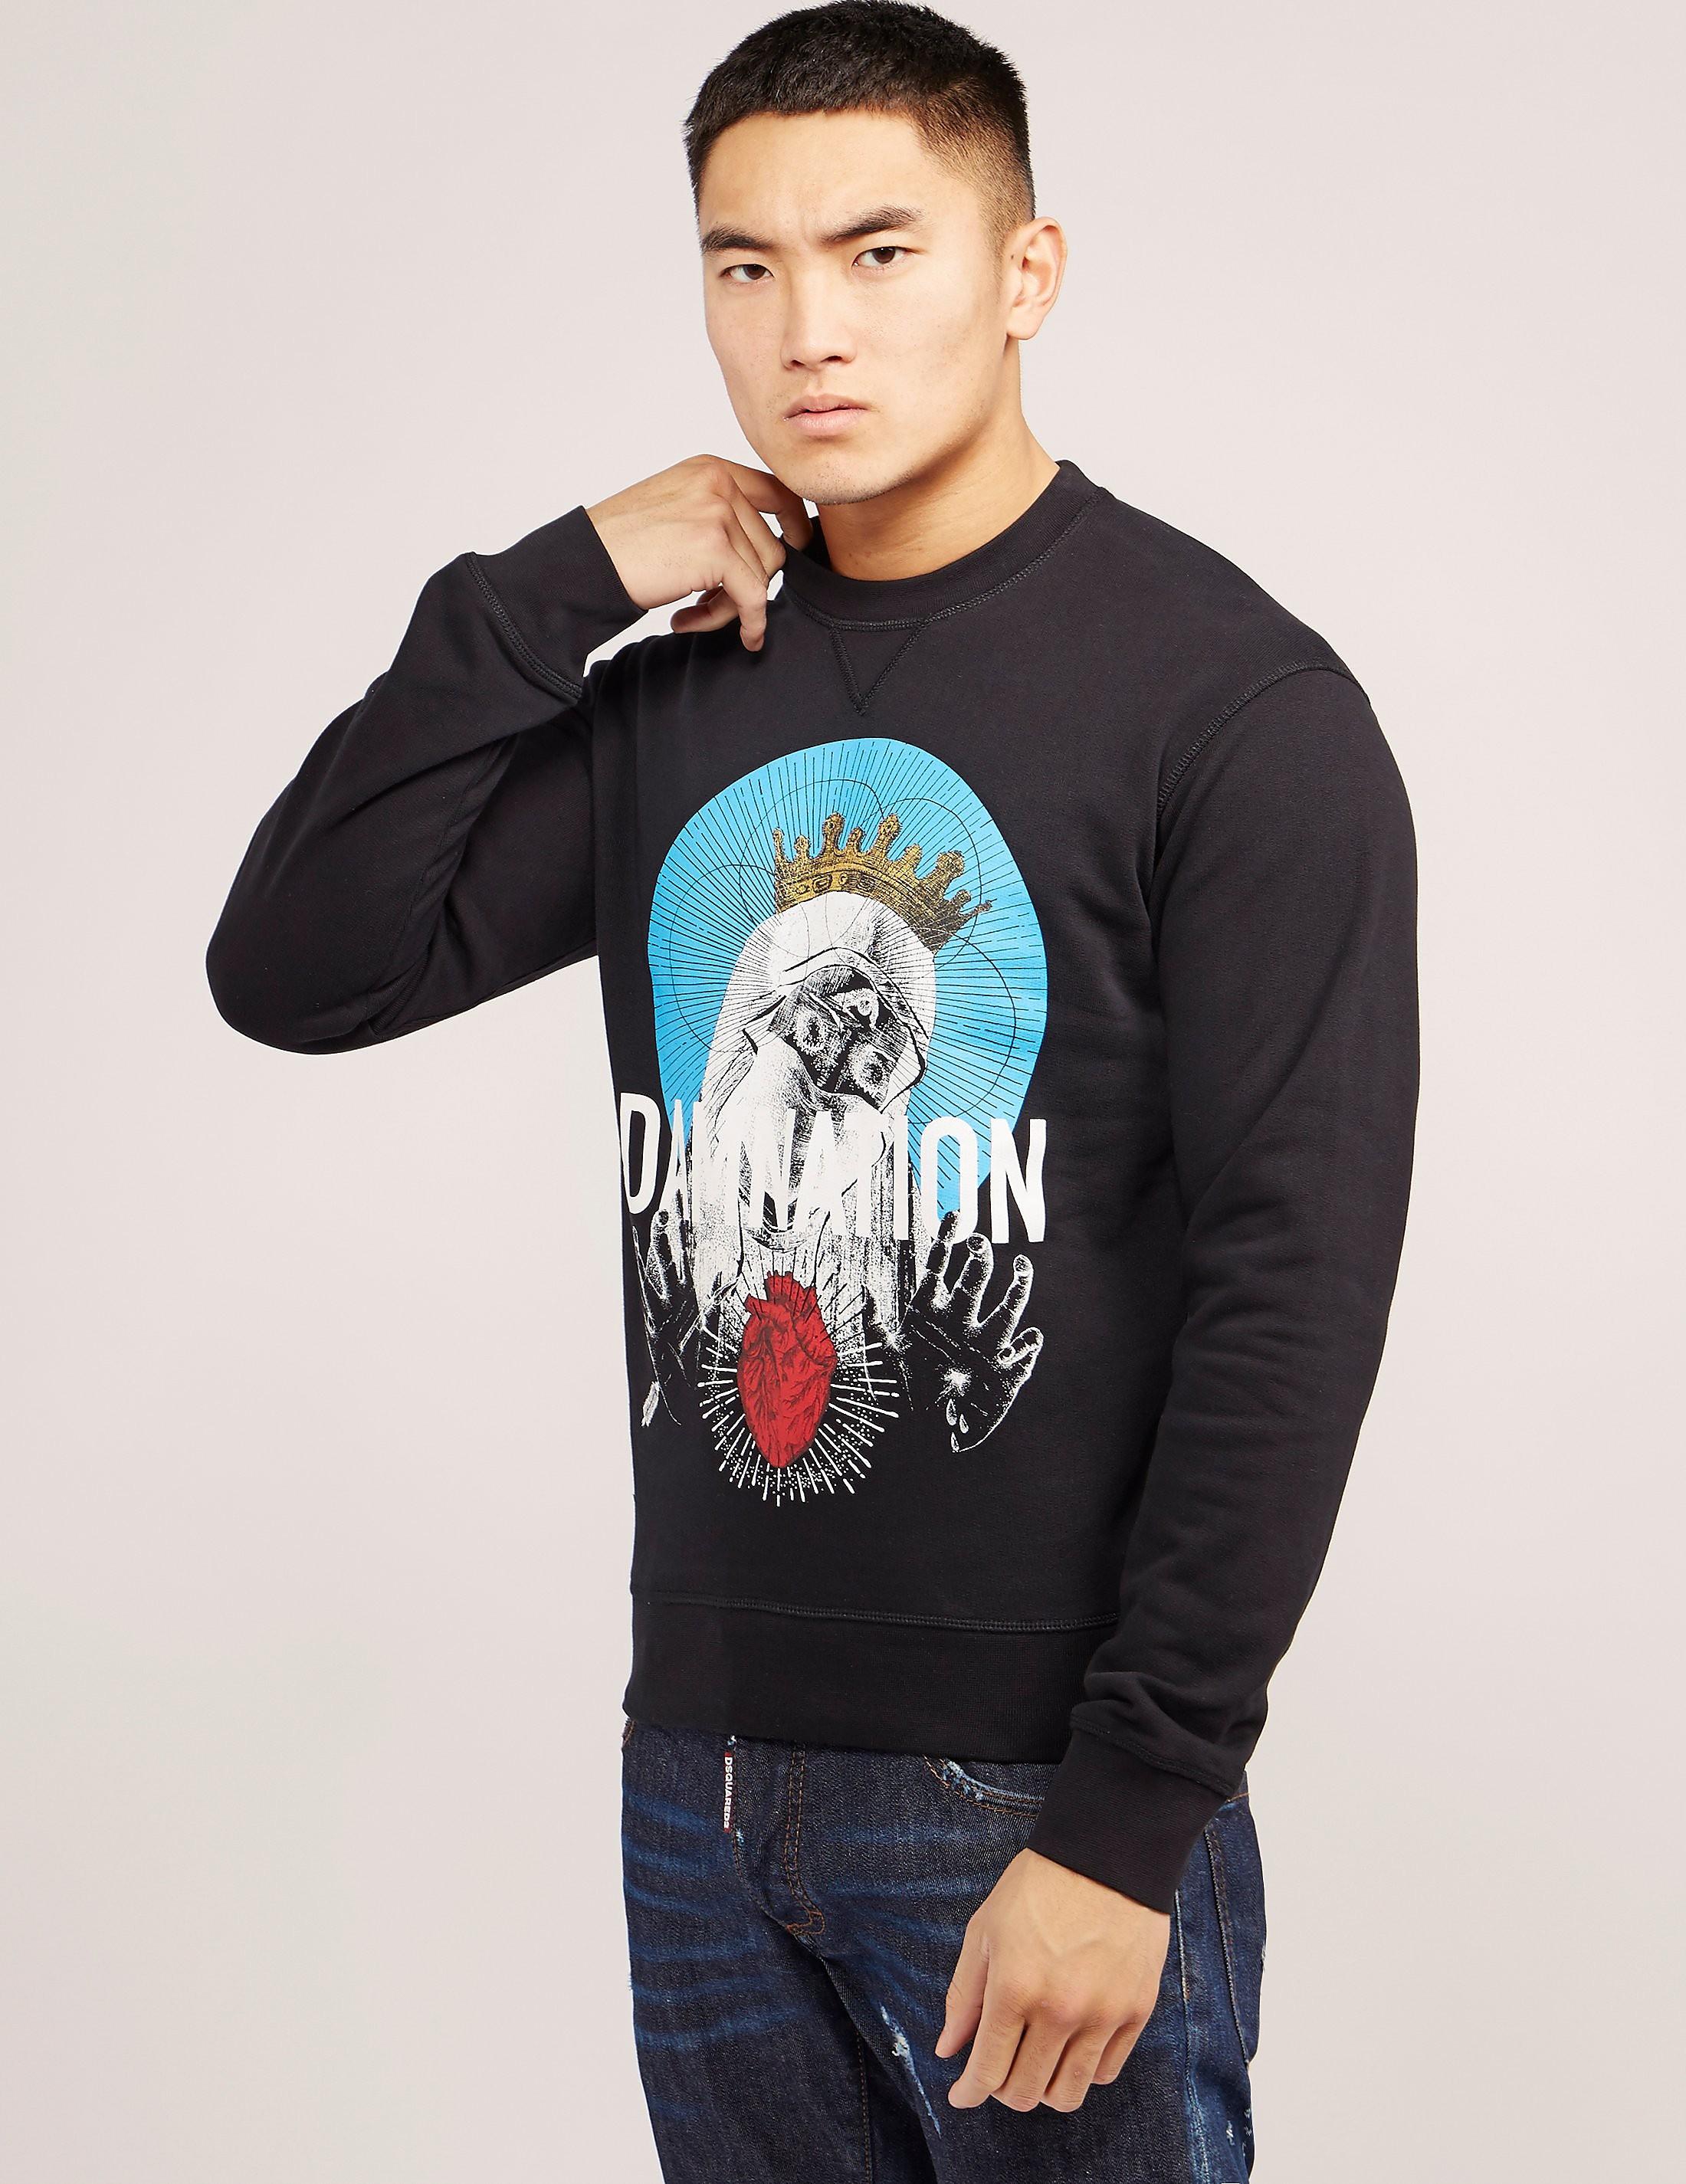 DSQUARED2 Damnation Sweatshirt